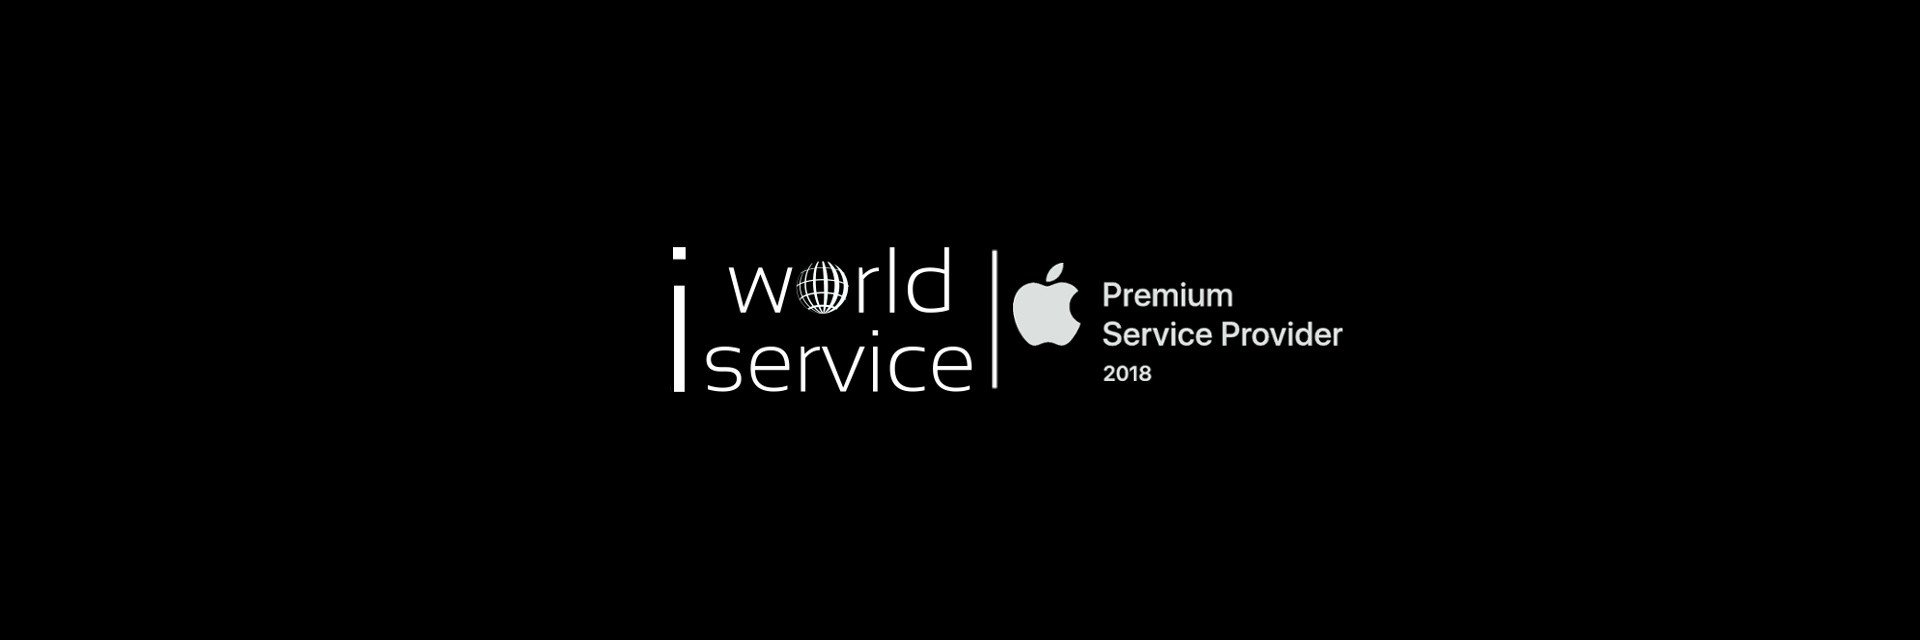 iWorldService zdobywa tytuł Premium Service Provider 2018